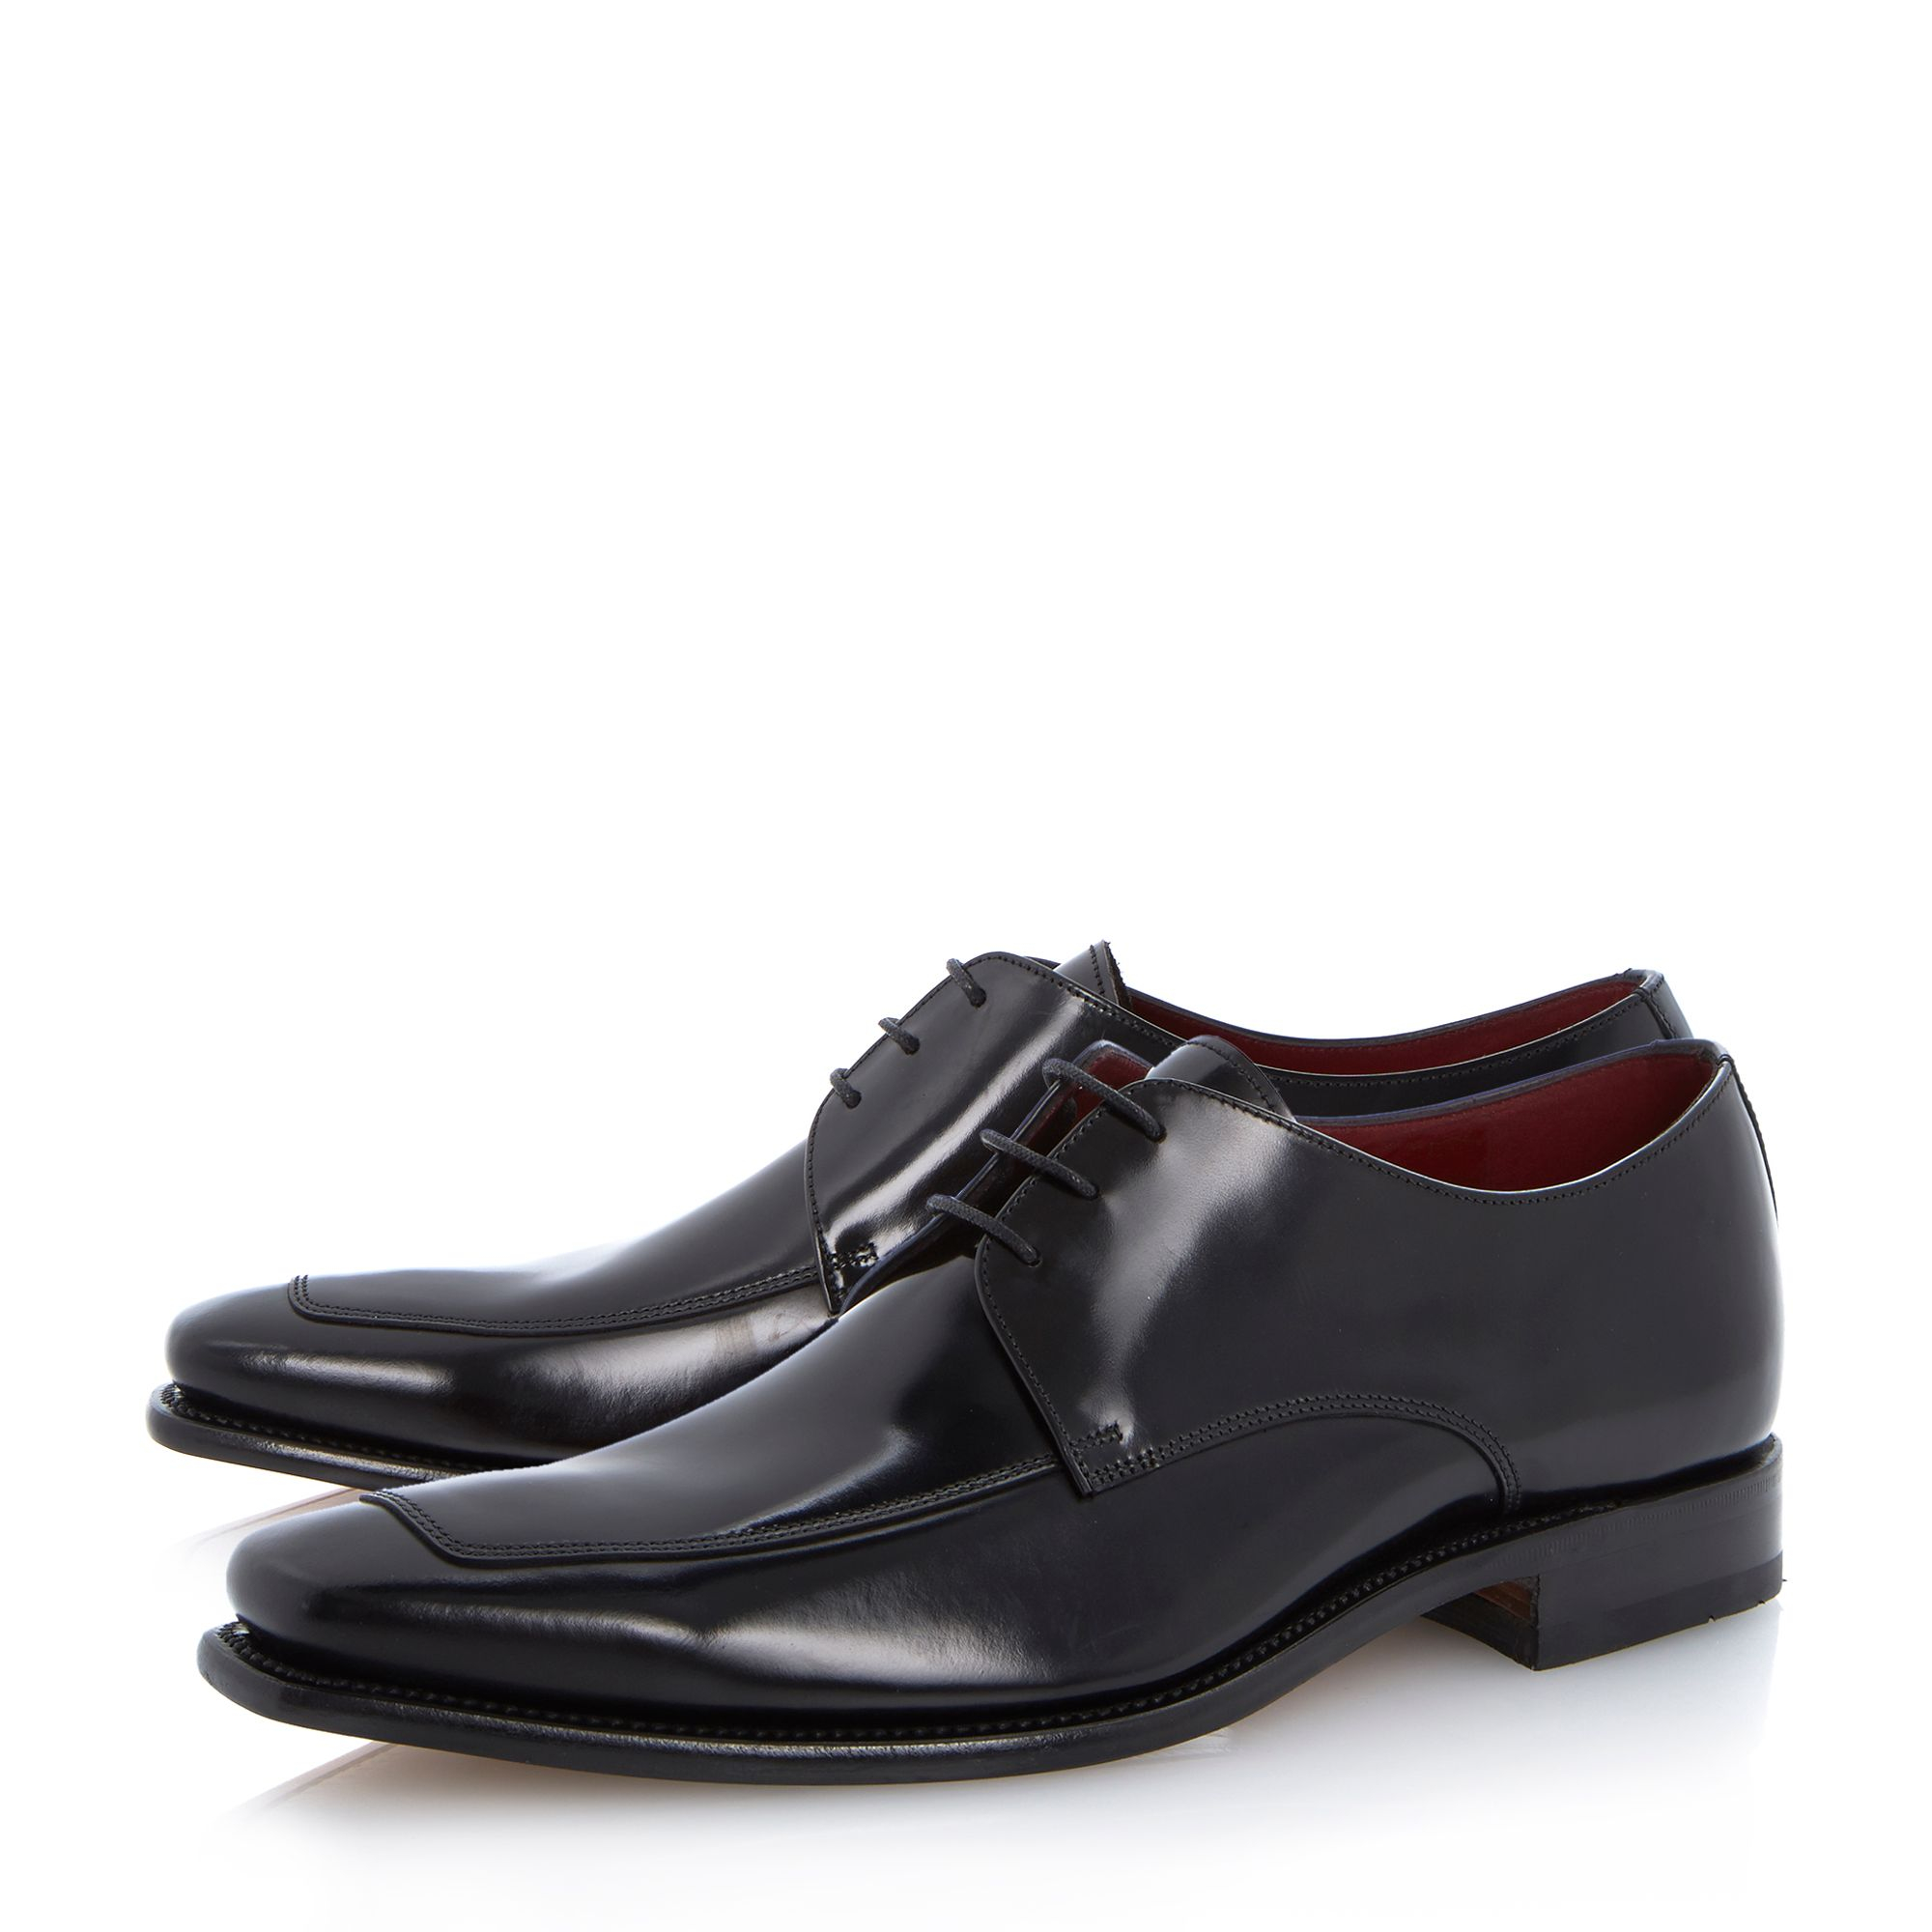 Loake Black Apron Lace Up Shoes